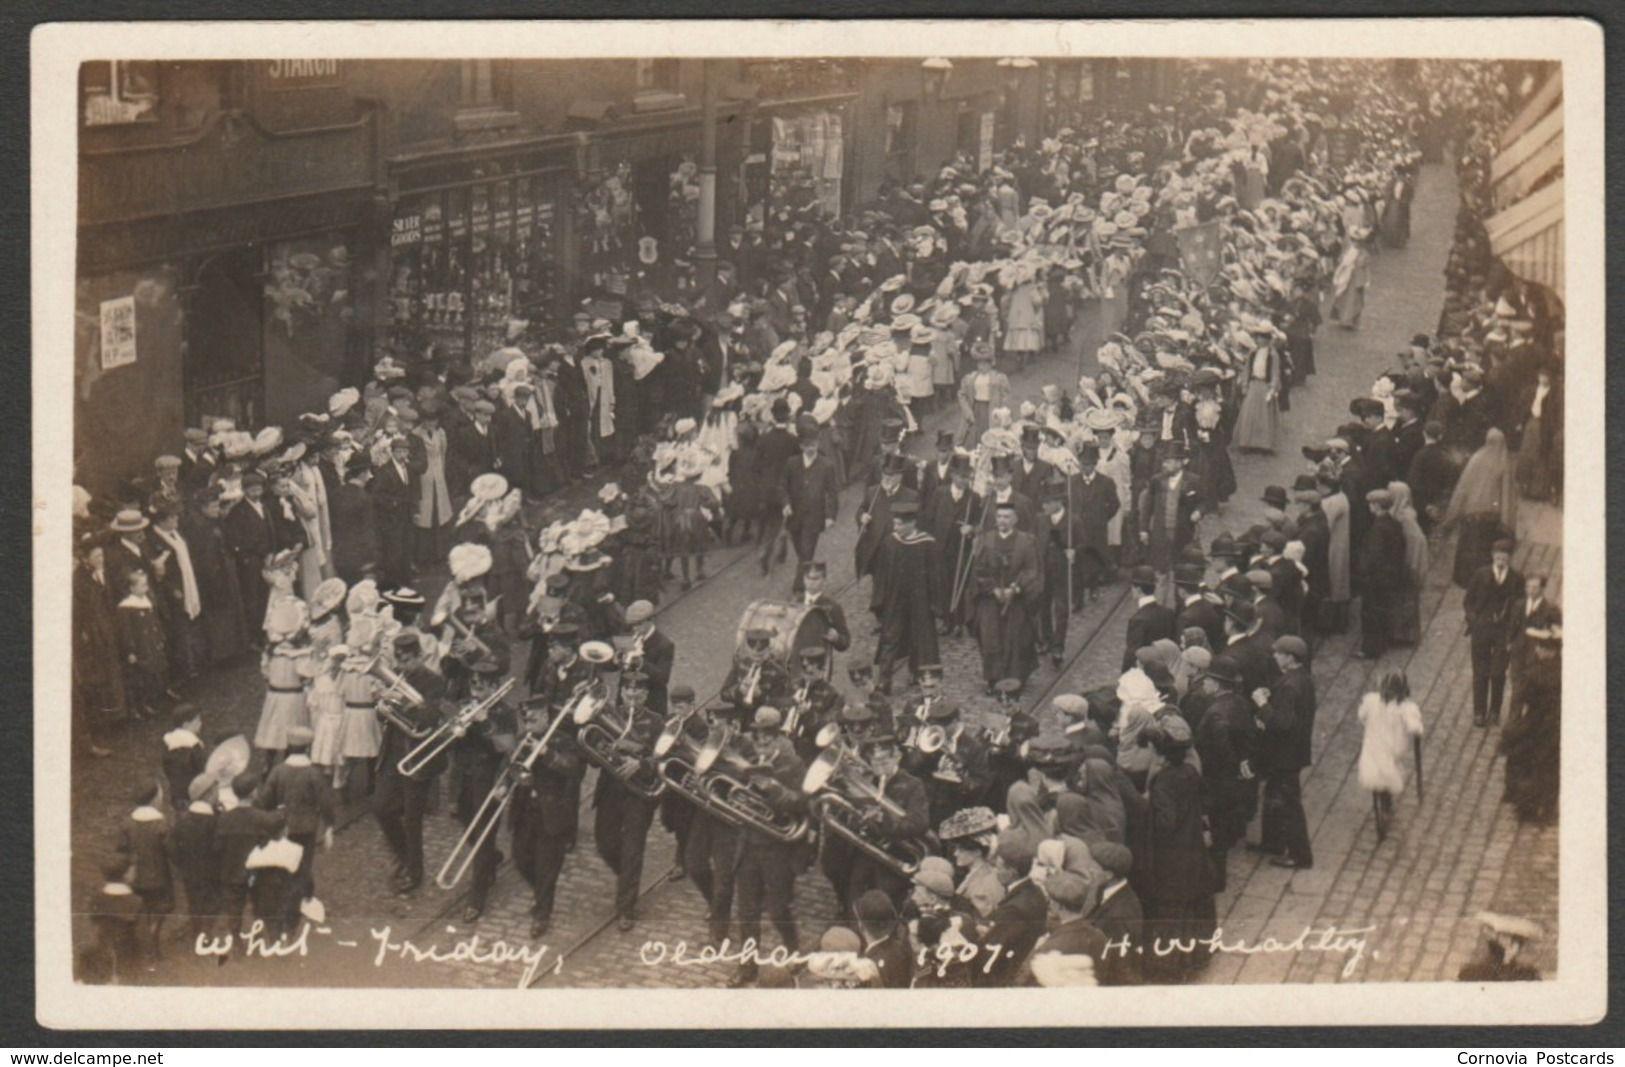 "Whit Friday Walk, Oldham, Lancashire, 1907 - Wheatley RP Postcard "" | For  sale on Delcampe"" | Postcard, Lancashire, Postcards for sale"